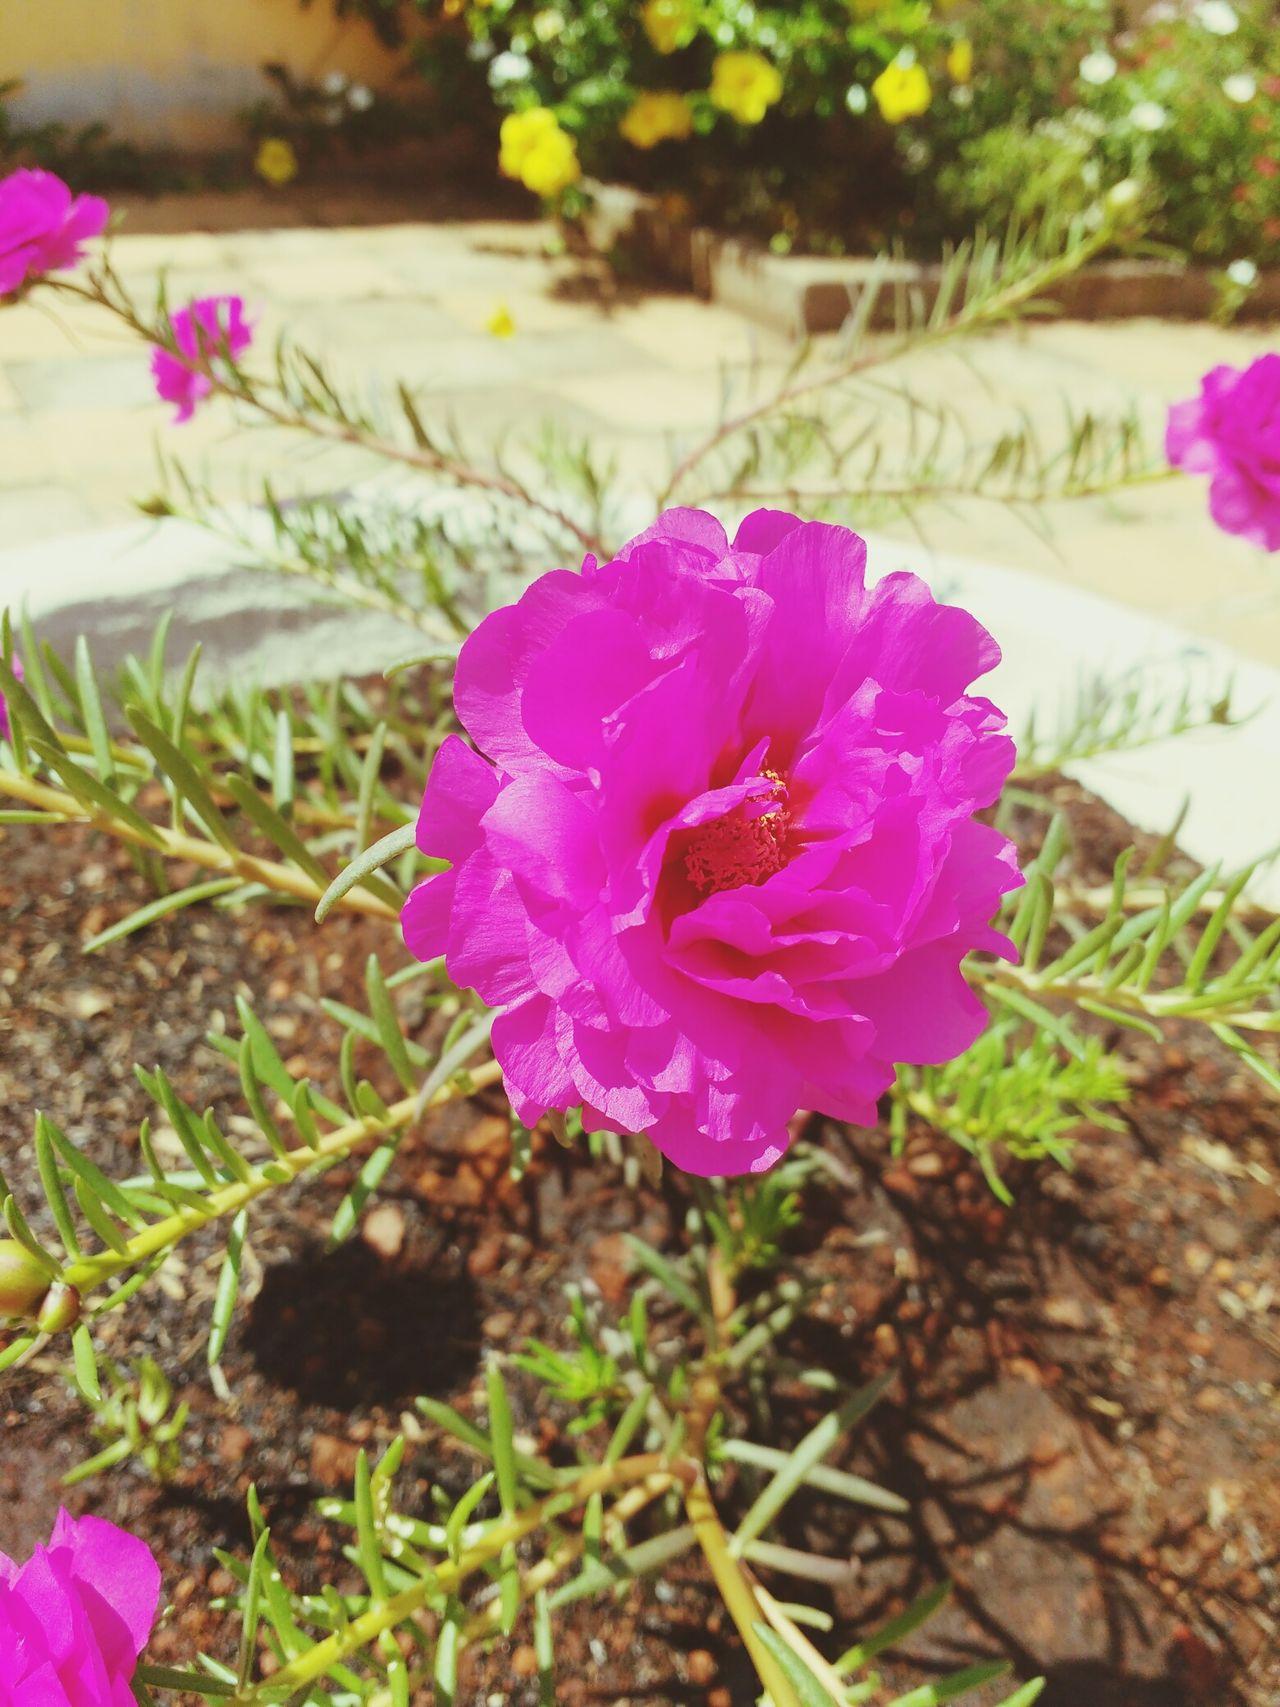 Onzehoras Jardim Goianiasualinda. Jardimamerica